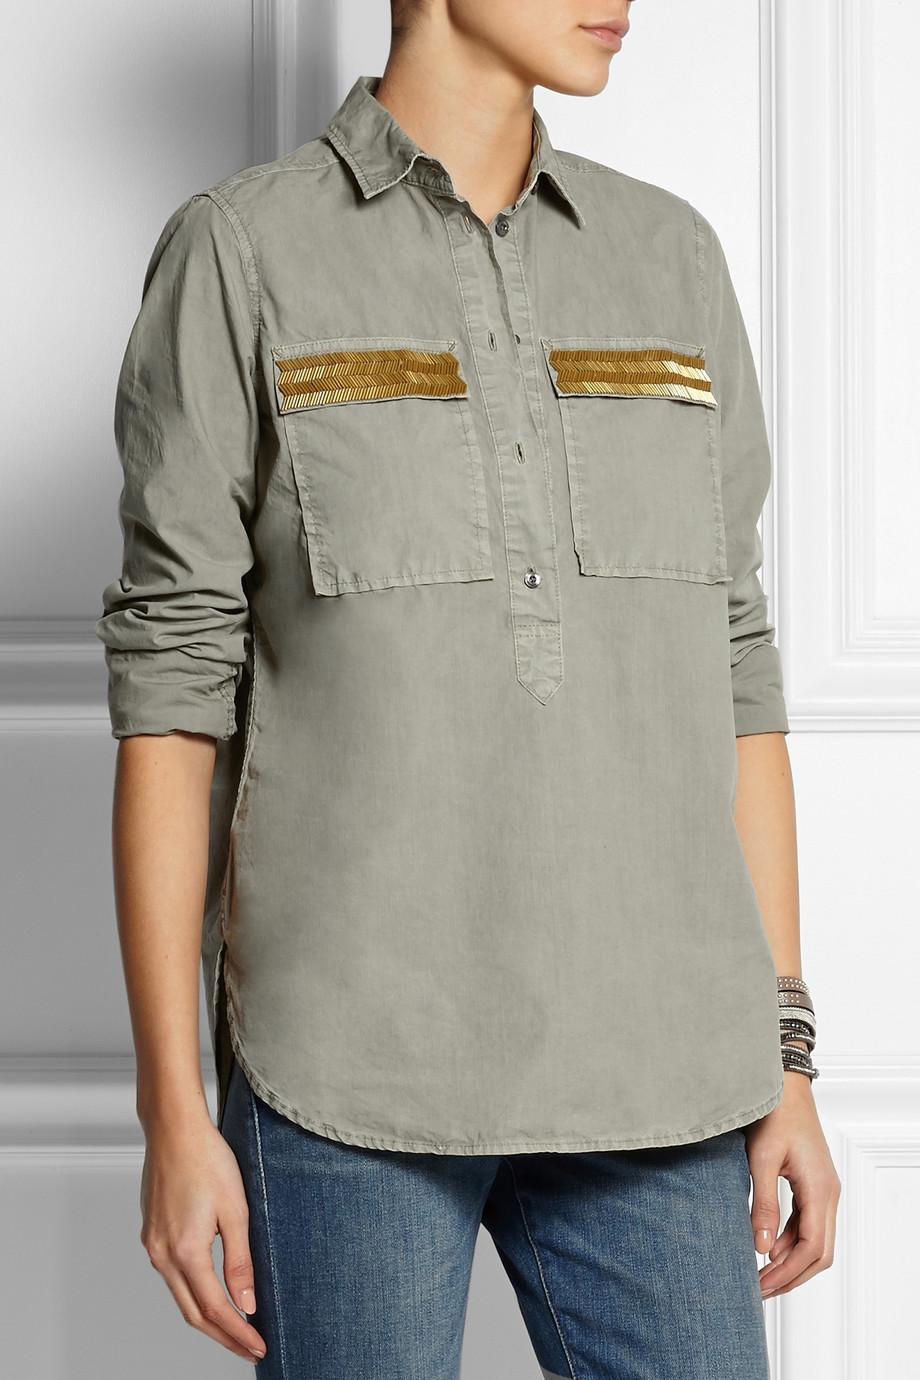 J.CREW - chemise